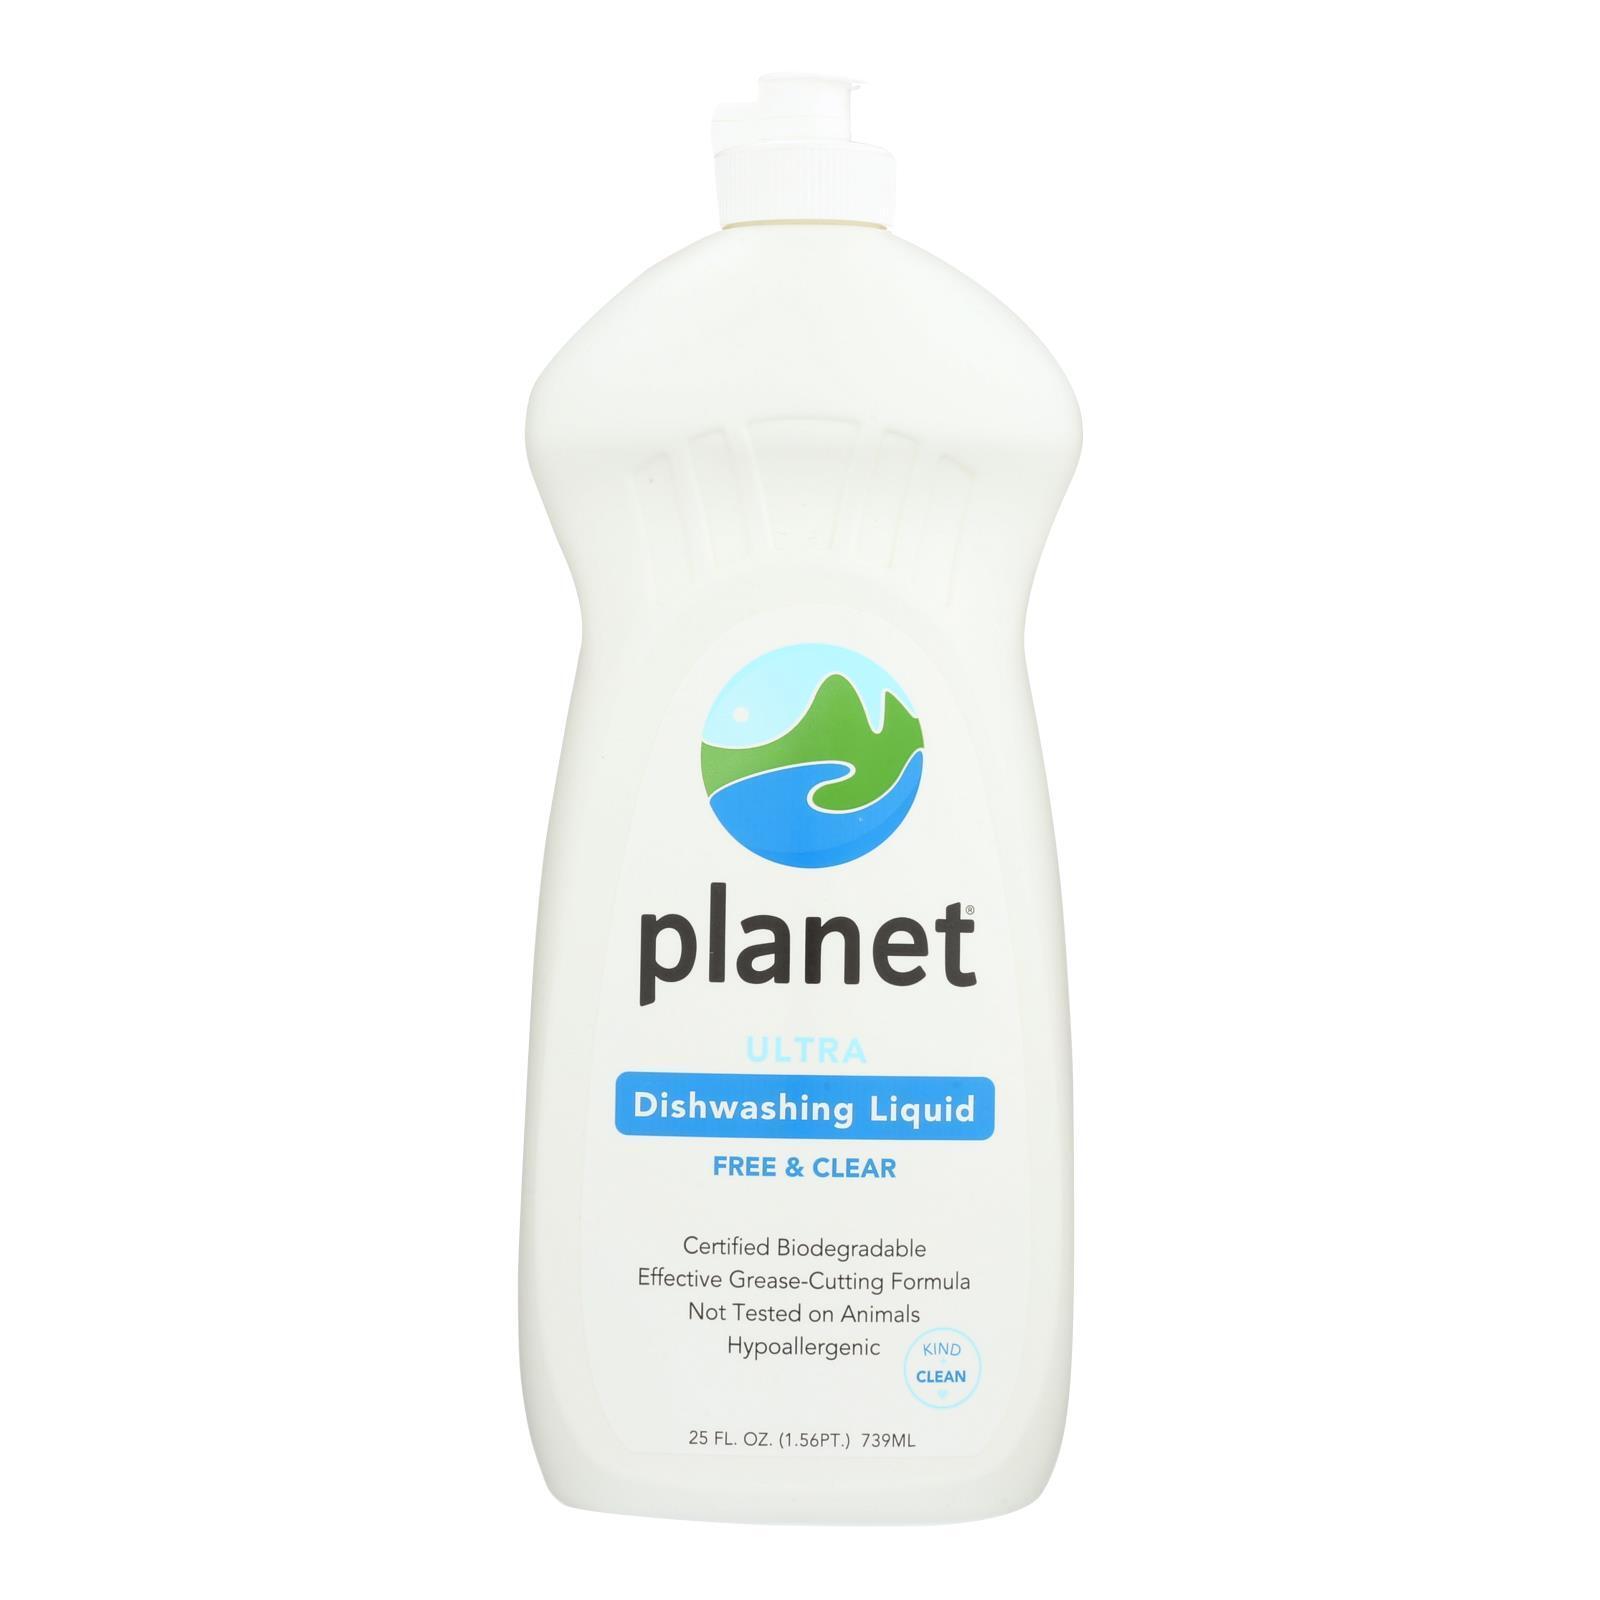 Planet Dishwashing Liquid - Ultra - Case of 12 - 25 Fl oz.